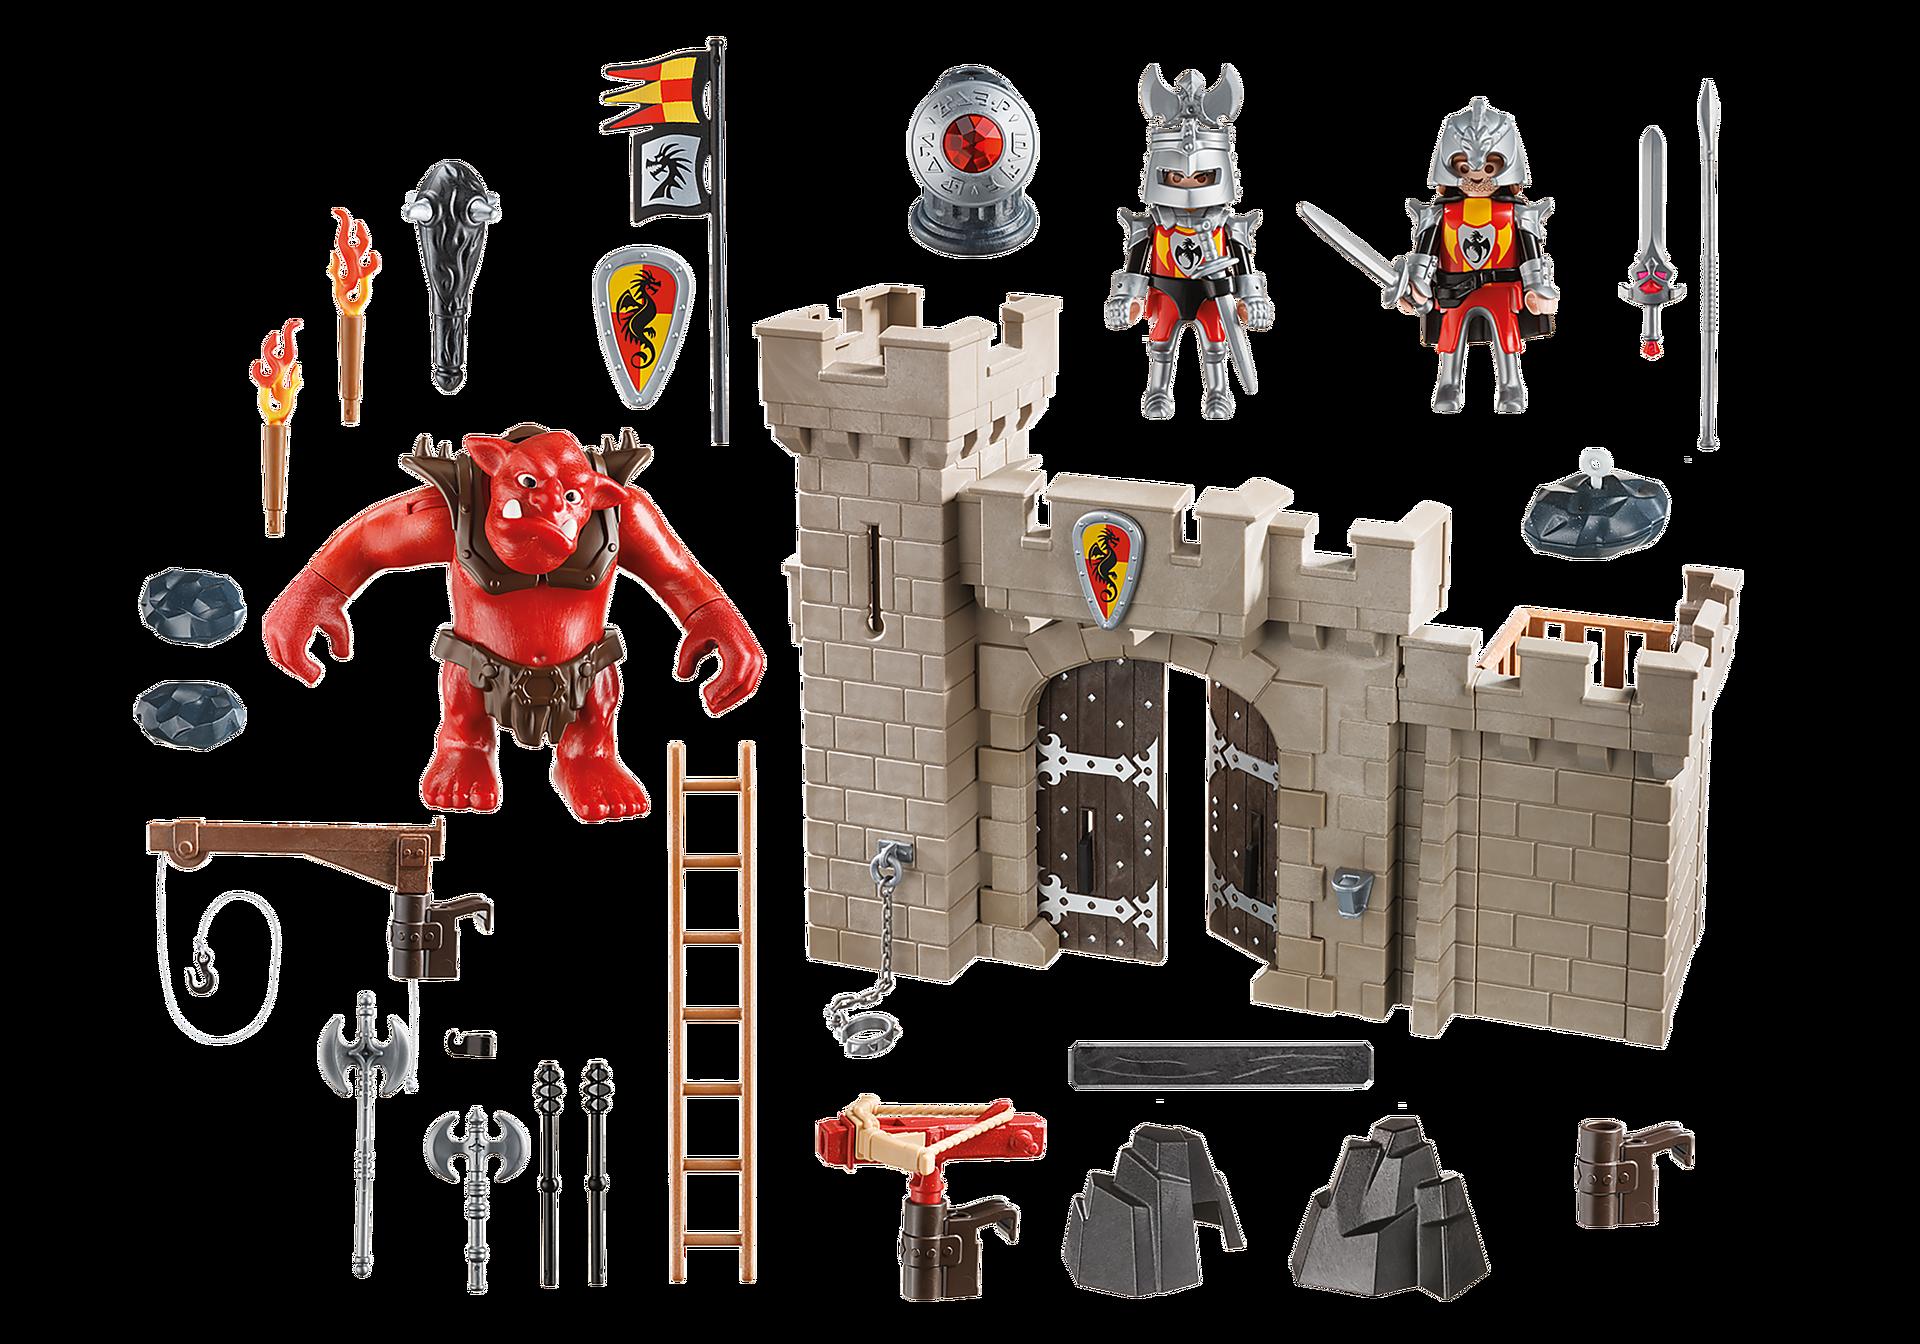 5670 Knights Castle Club Set zoom image3